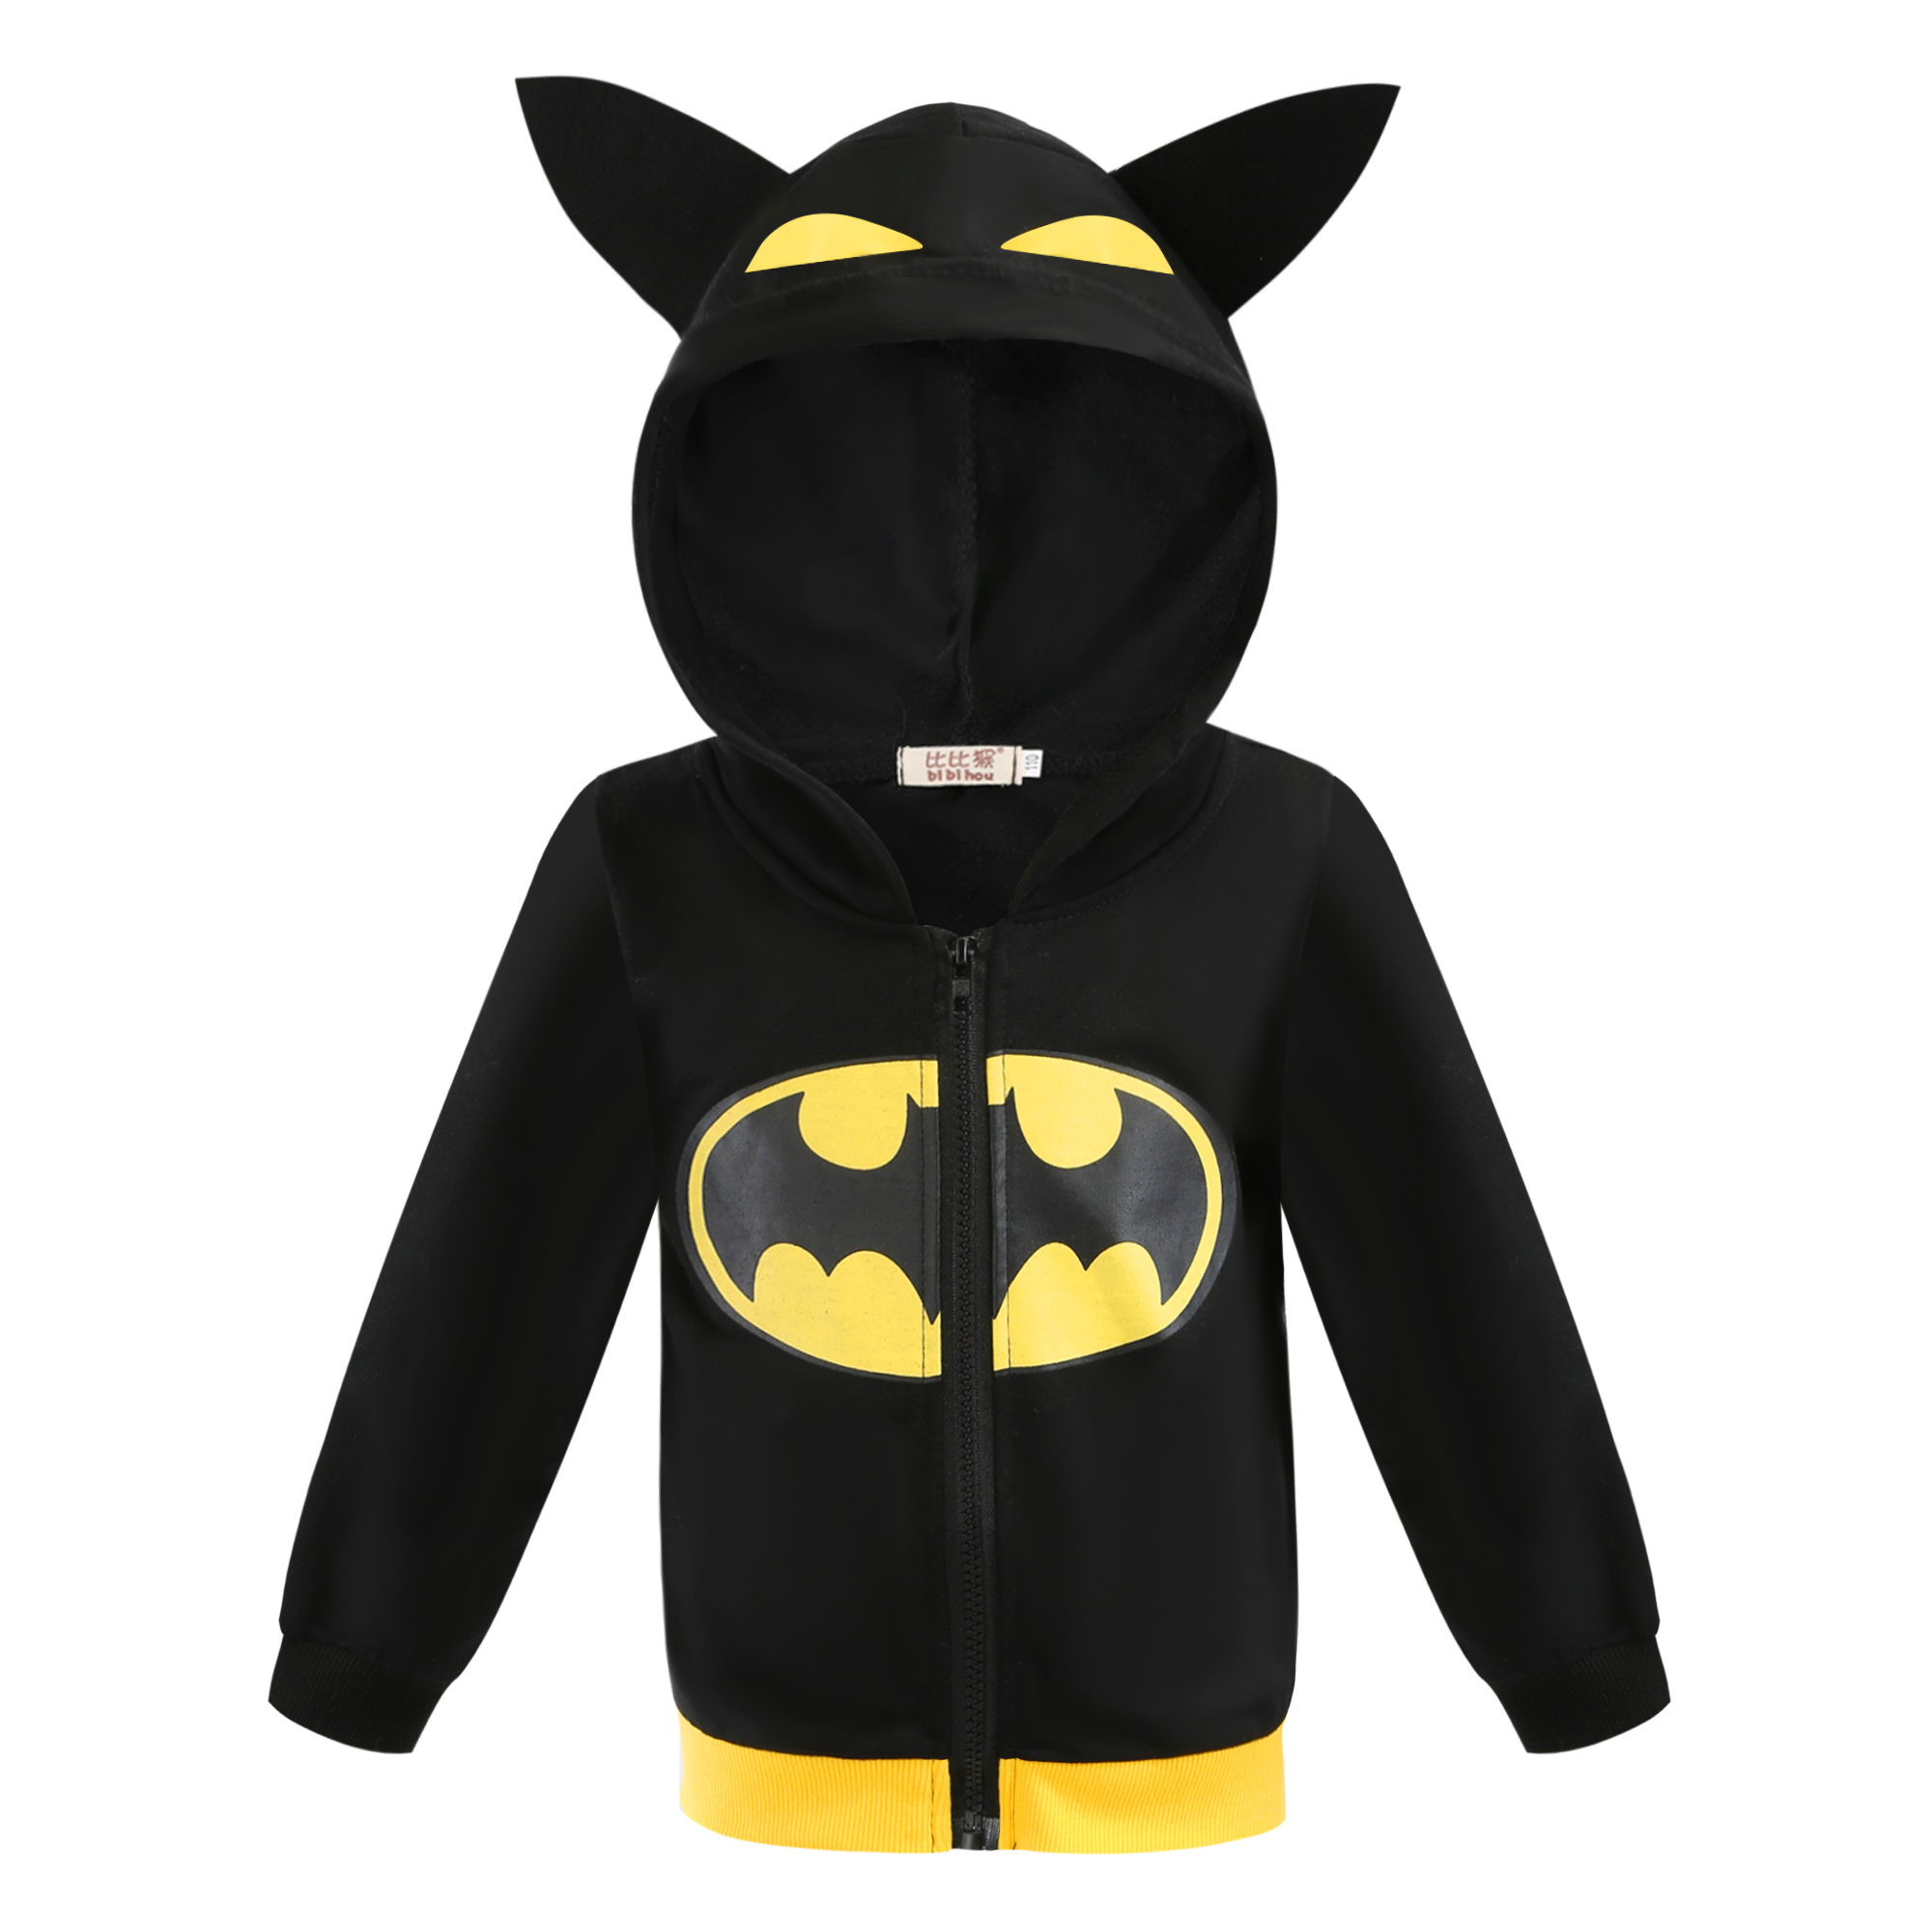 Spring Autumn Batman Coat Ninja Turtle Hoodies Children's Jacket Spider-Man Captain America Boys Zipper Jacket Boys Clothes